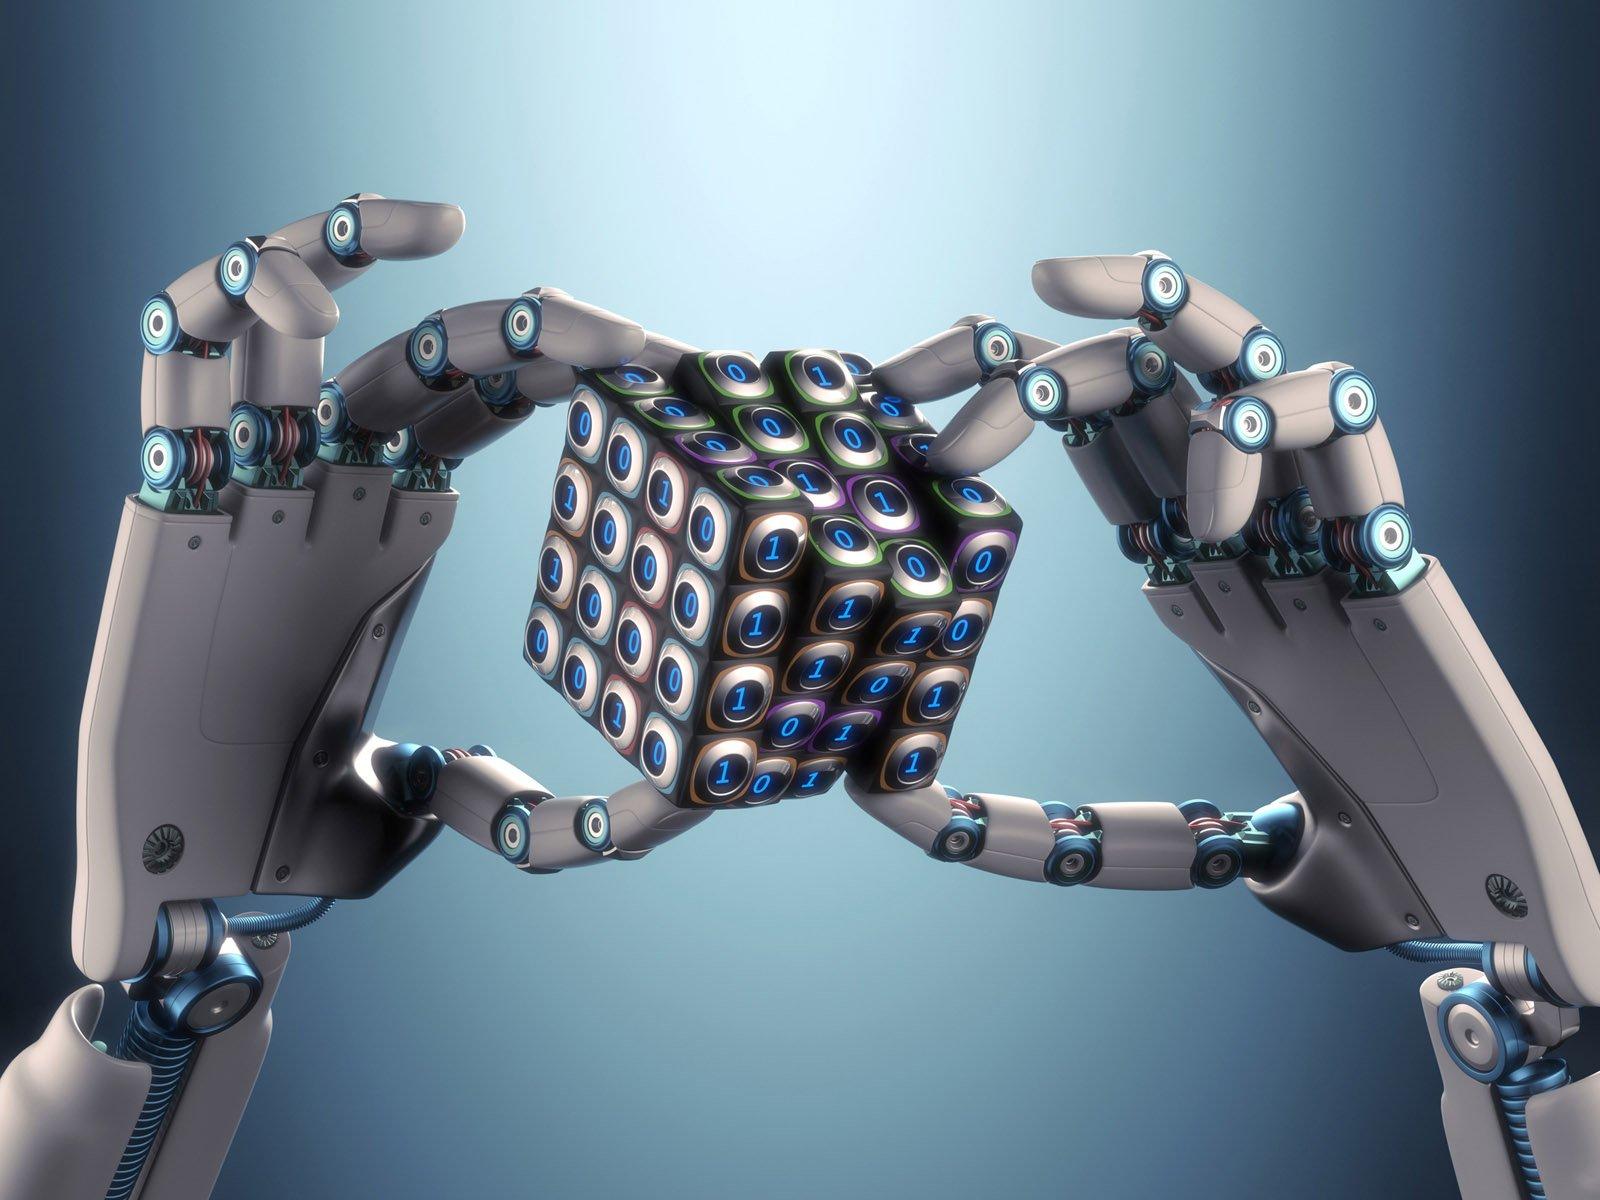 robotics-process-automation-rpa-technology-4